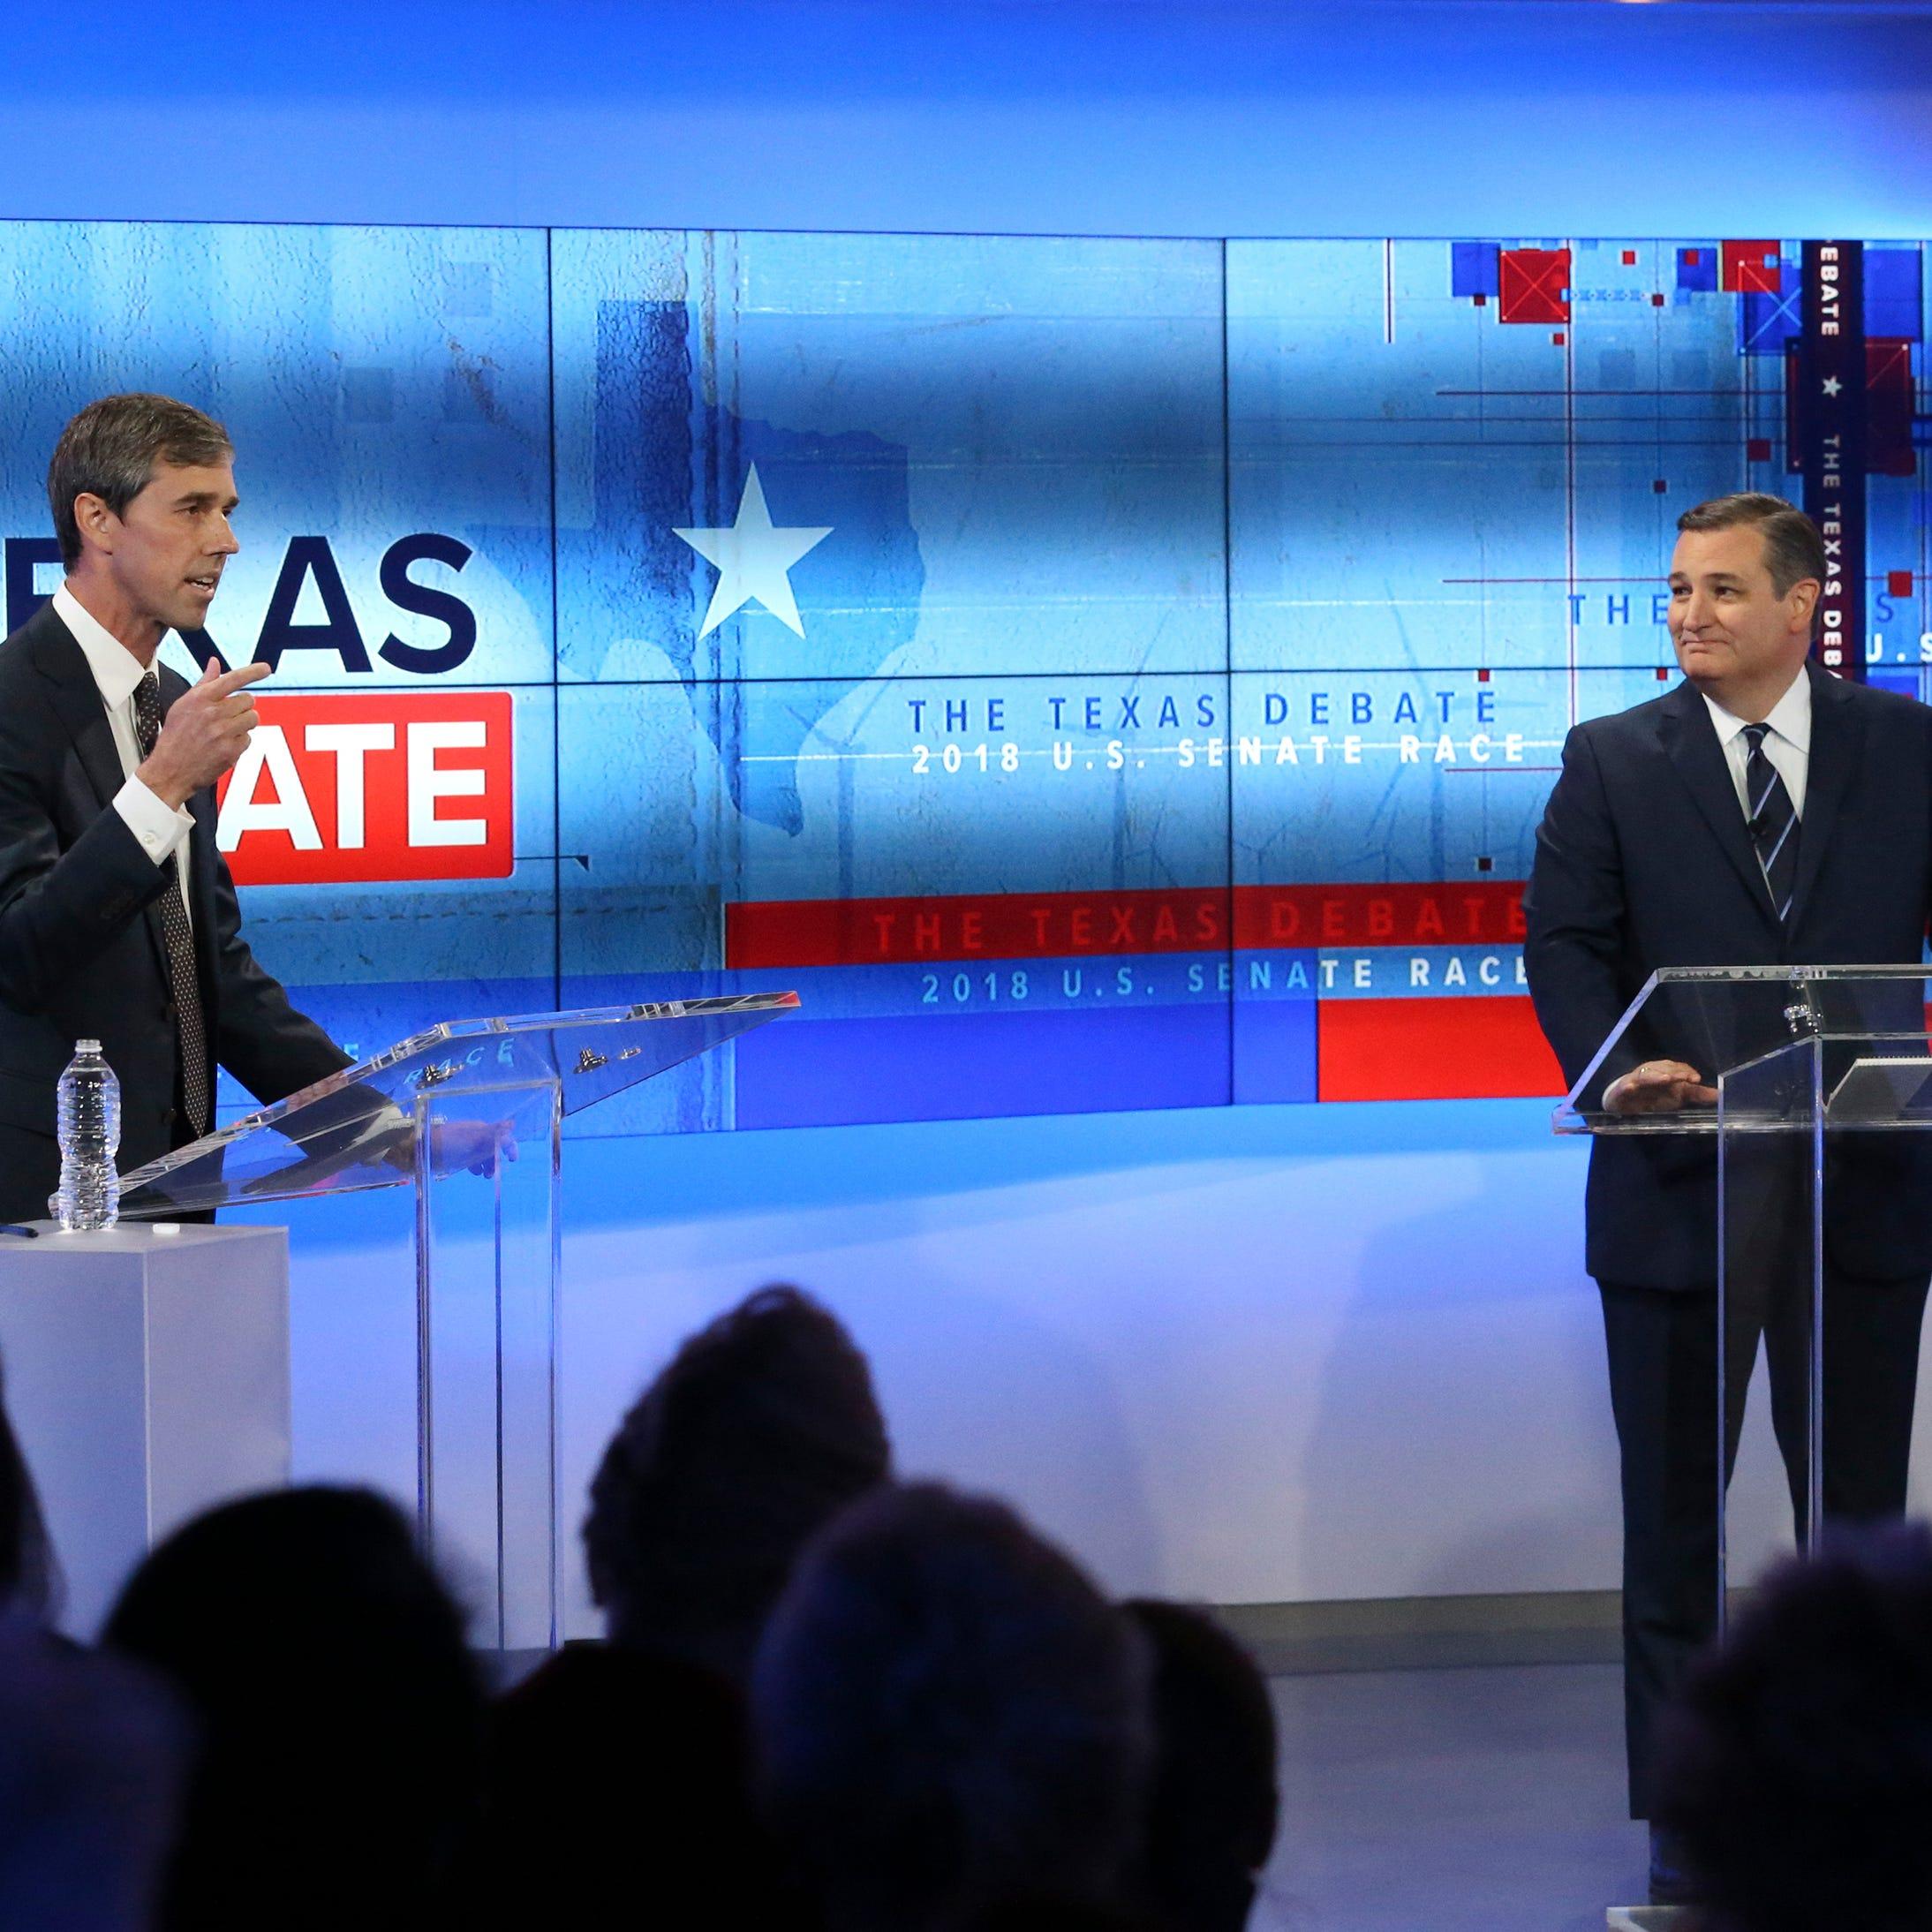 Cruz-Beto debate: Who won the final Texas debate between Ted Cruz and Beto O'Rourke?